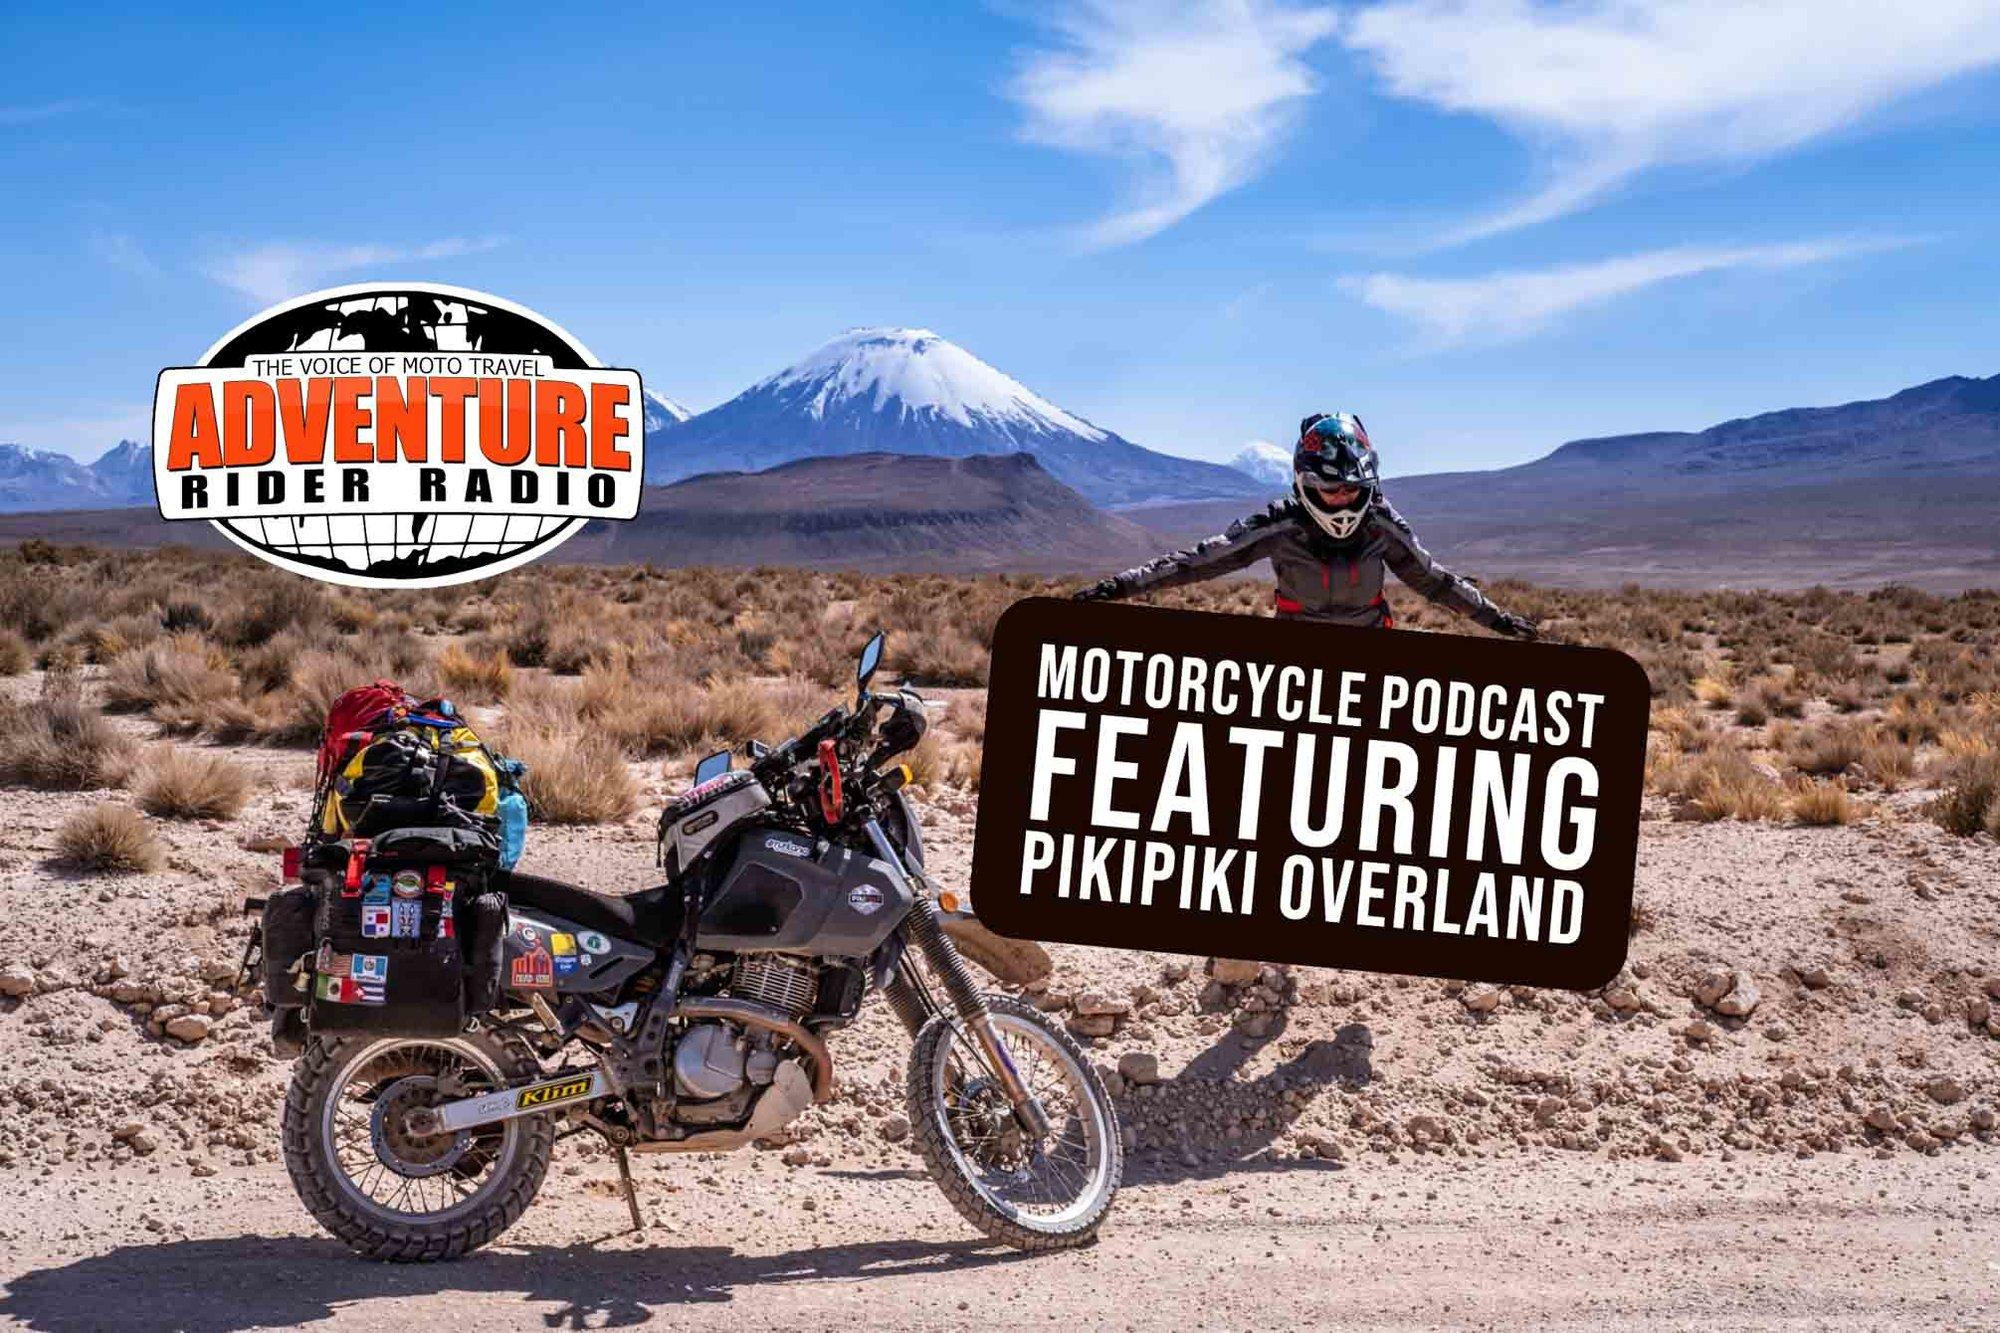 ARR Adventure rider radio PikiPiki.jpg